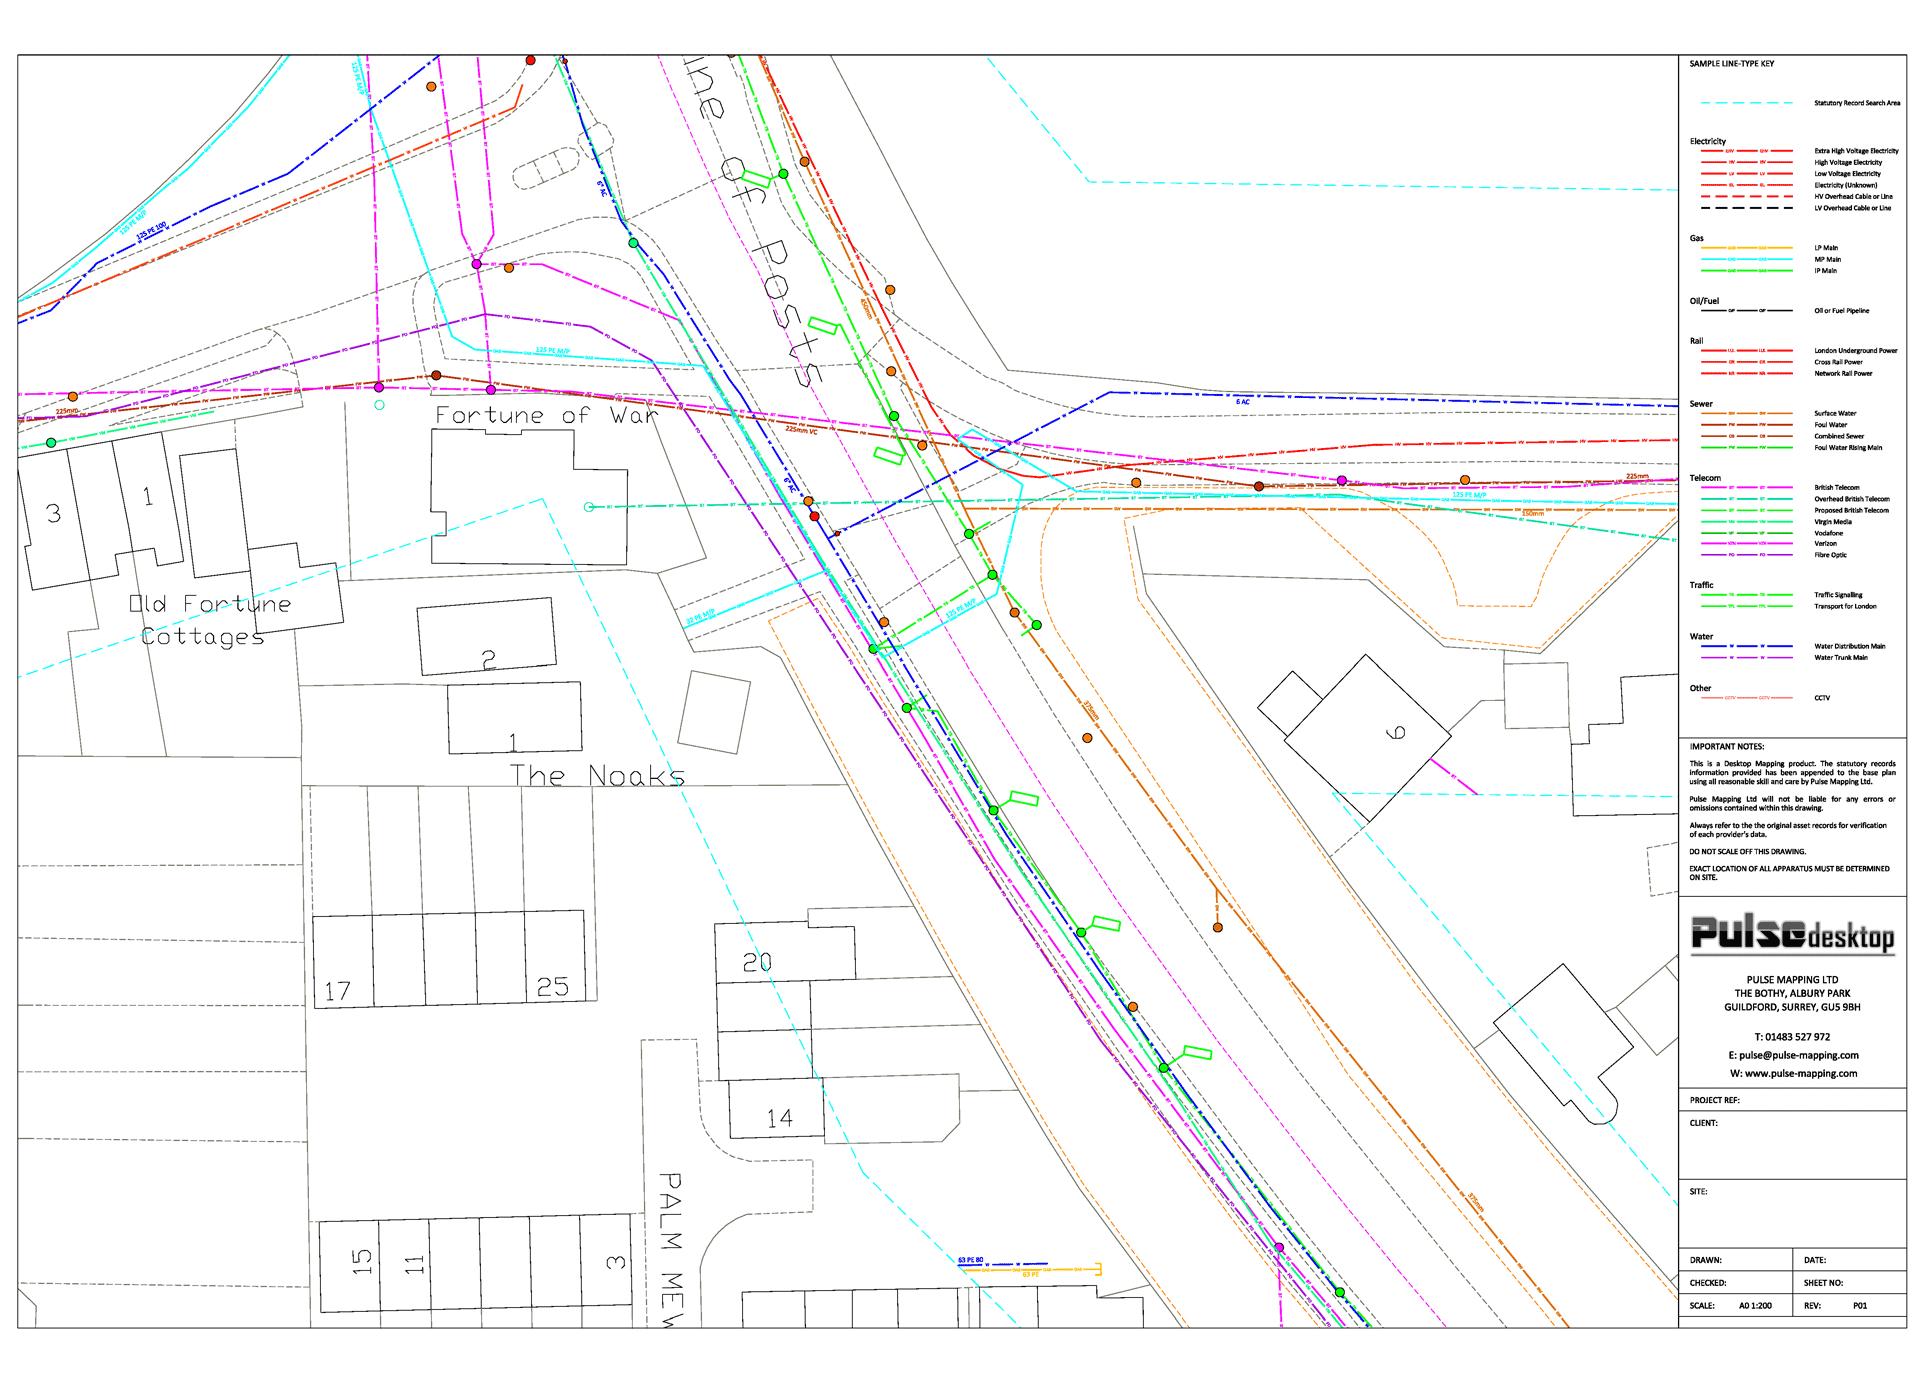 Desktop mapping of statutory asset records